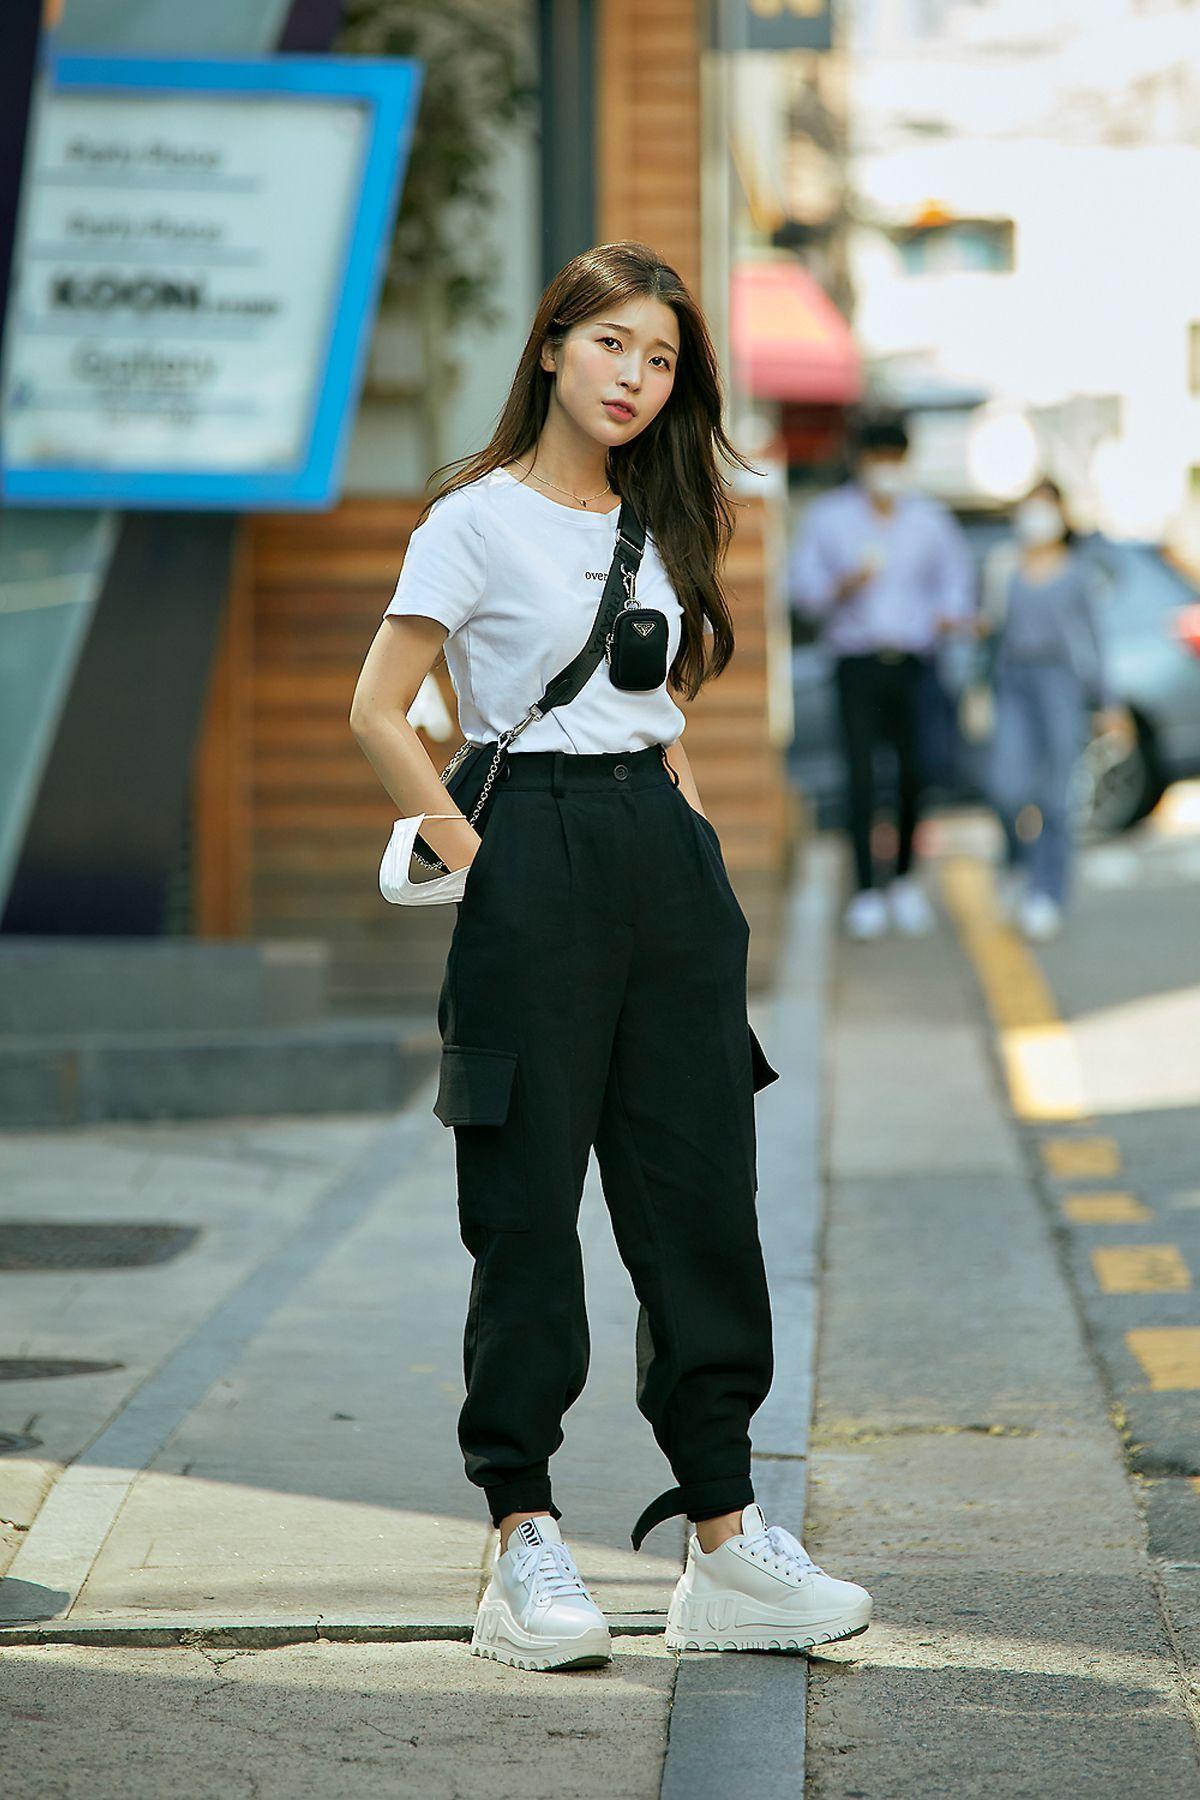 Classy Fashion Tips .Classy Fashion Tips  Girl street fashion